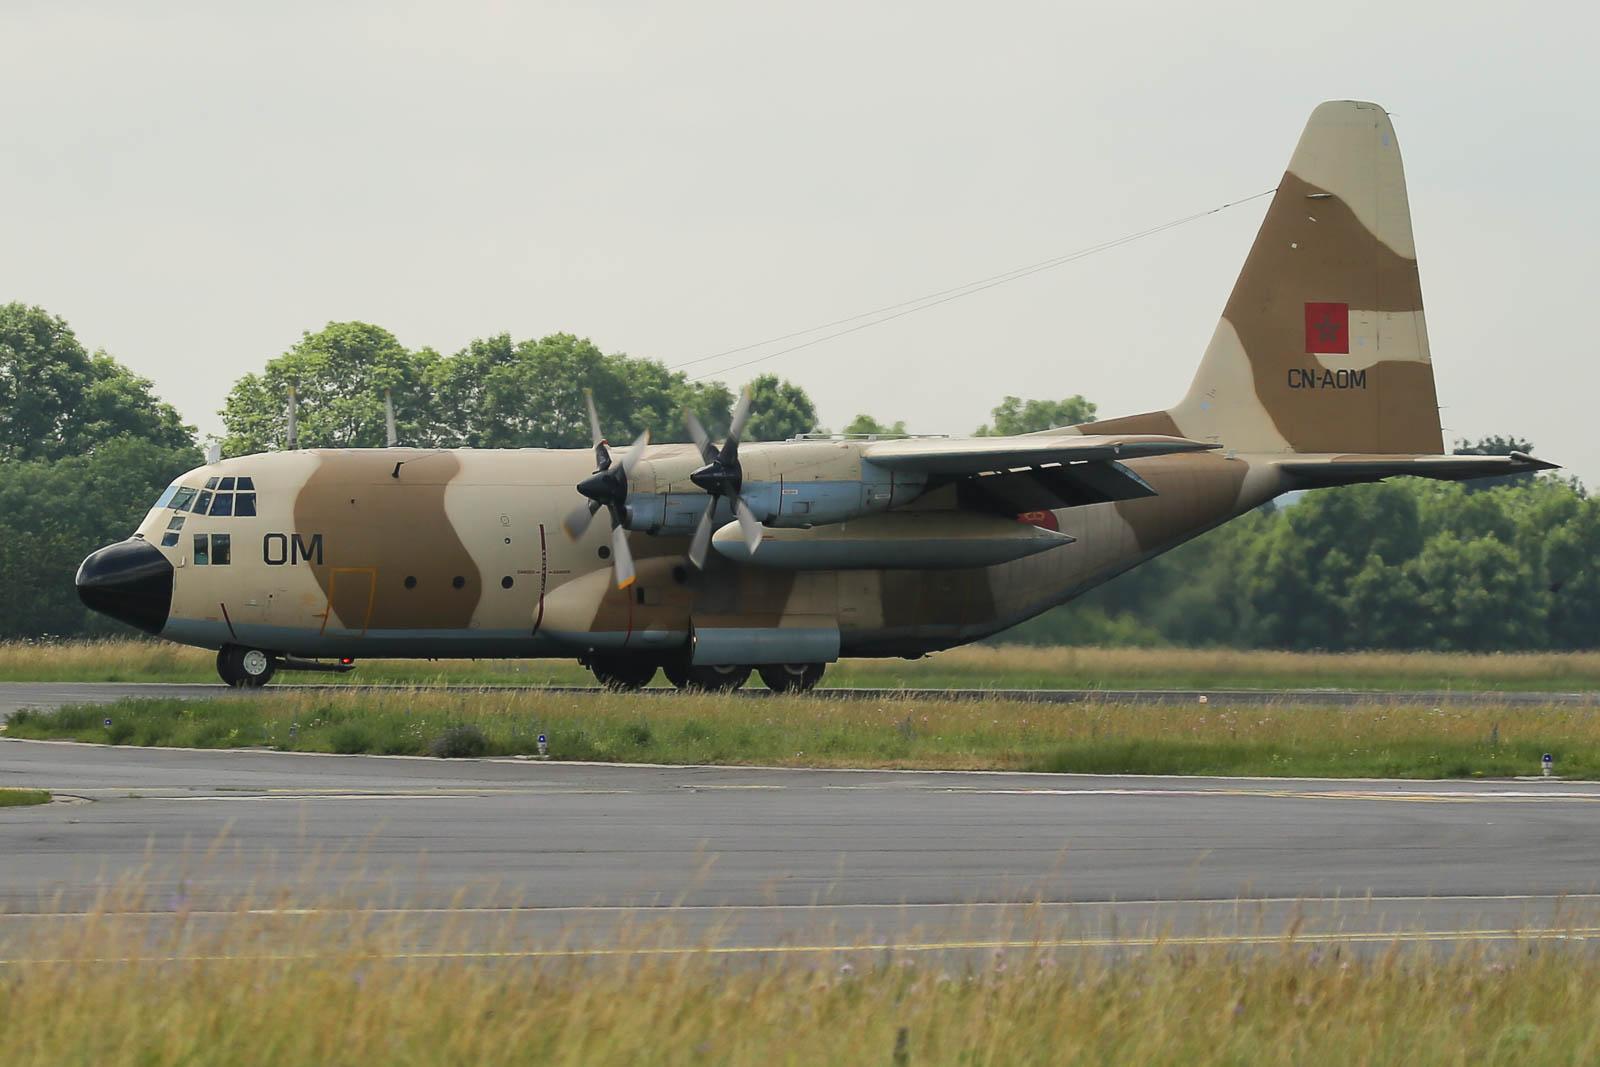 FRA: Photos d'avions de transport - Page 43 51269660393_f281d4914f_o_d